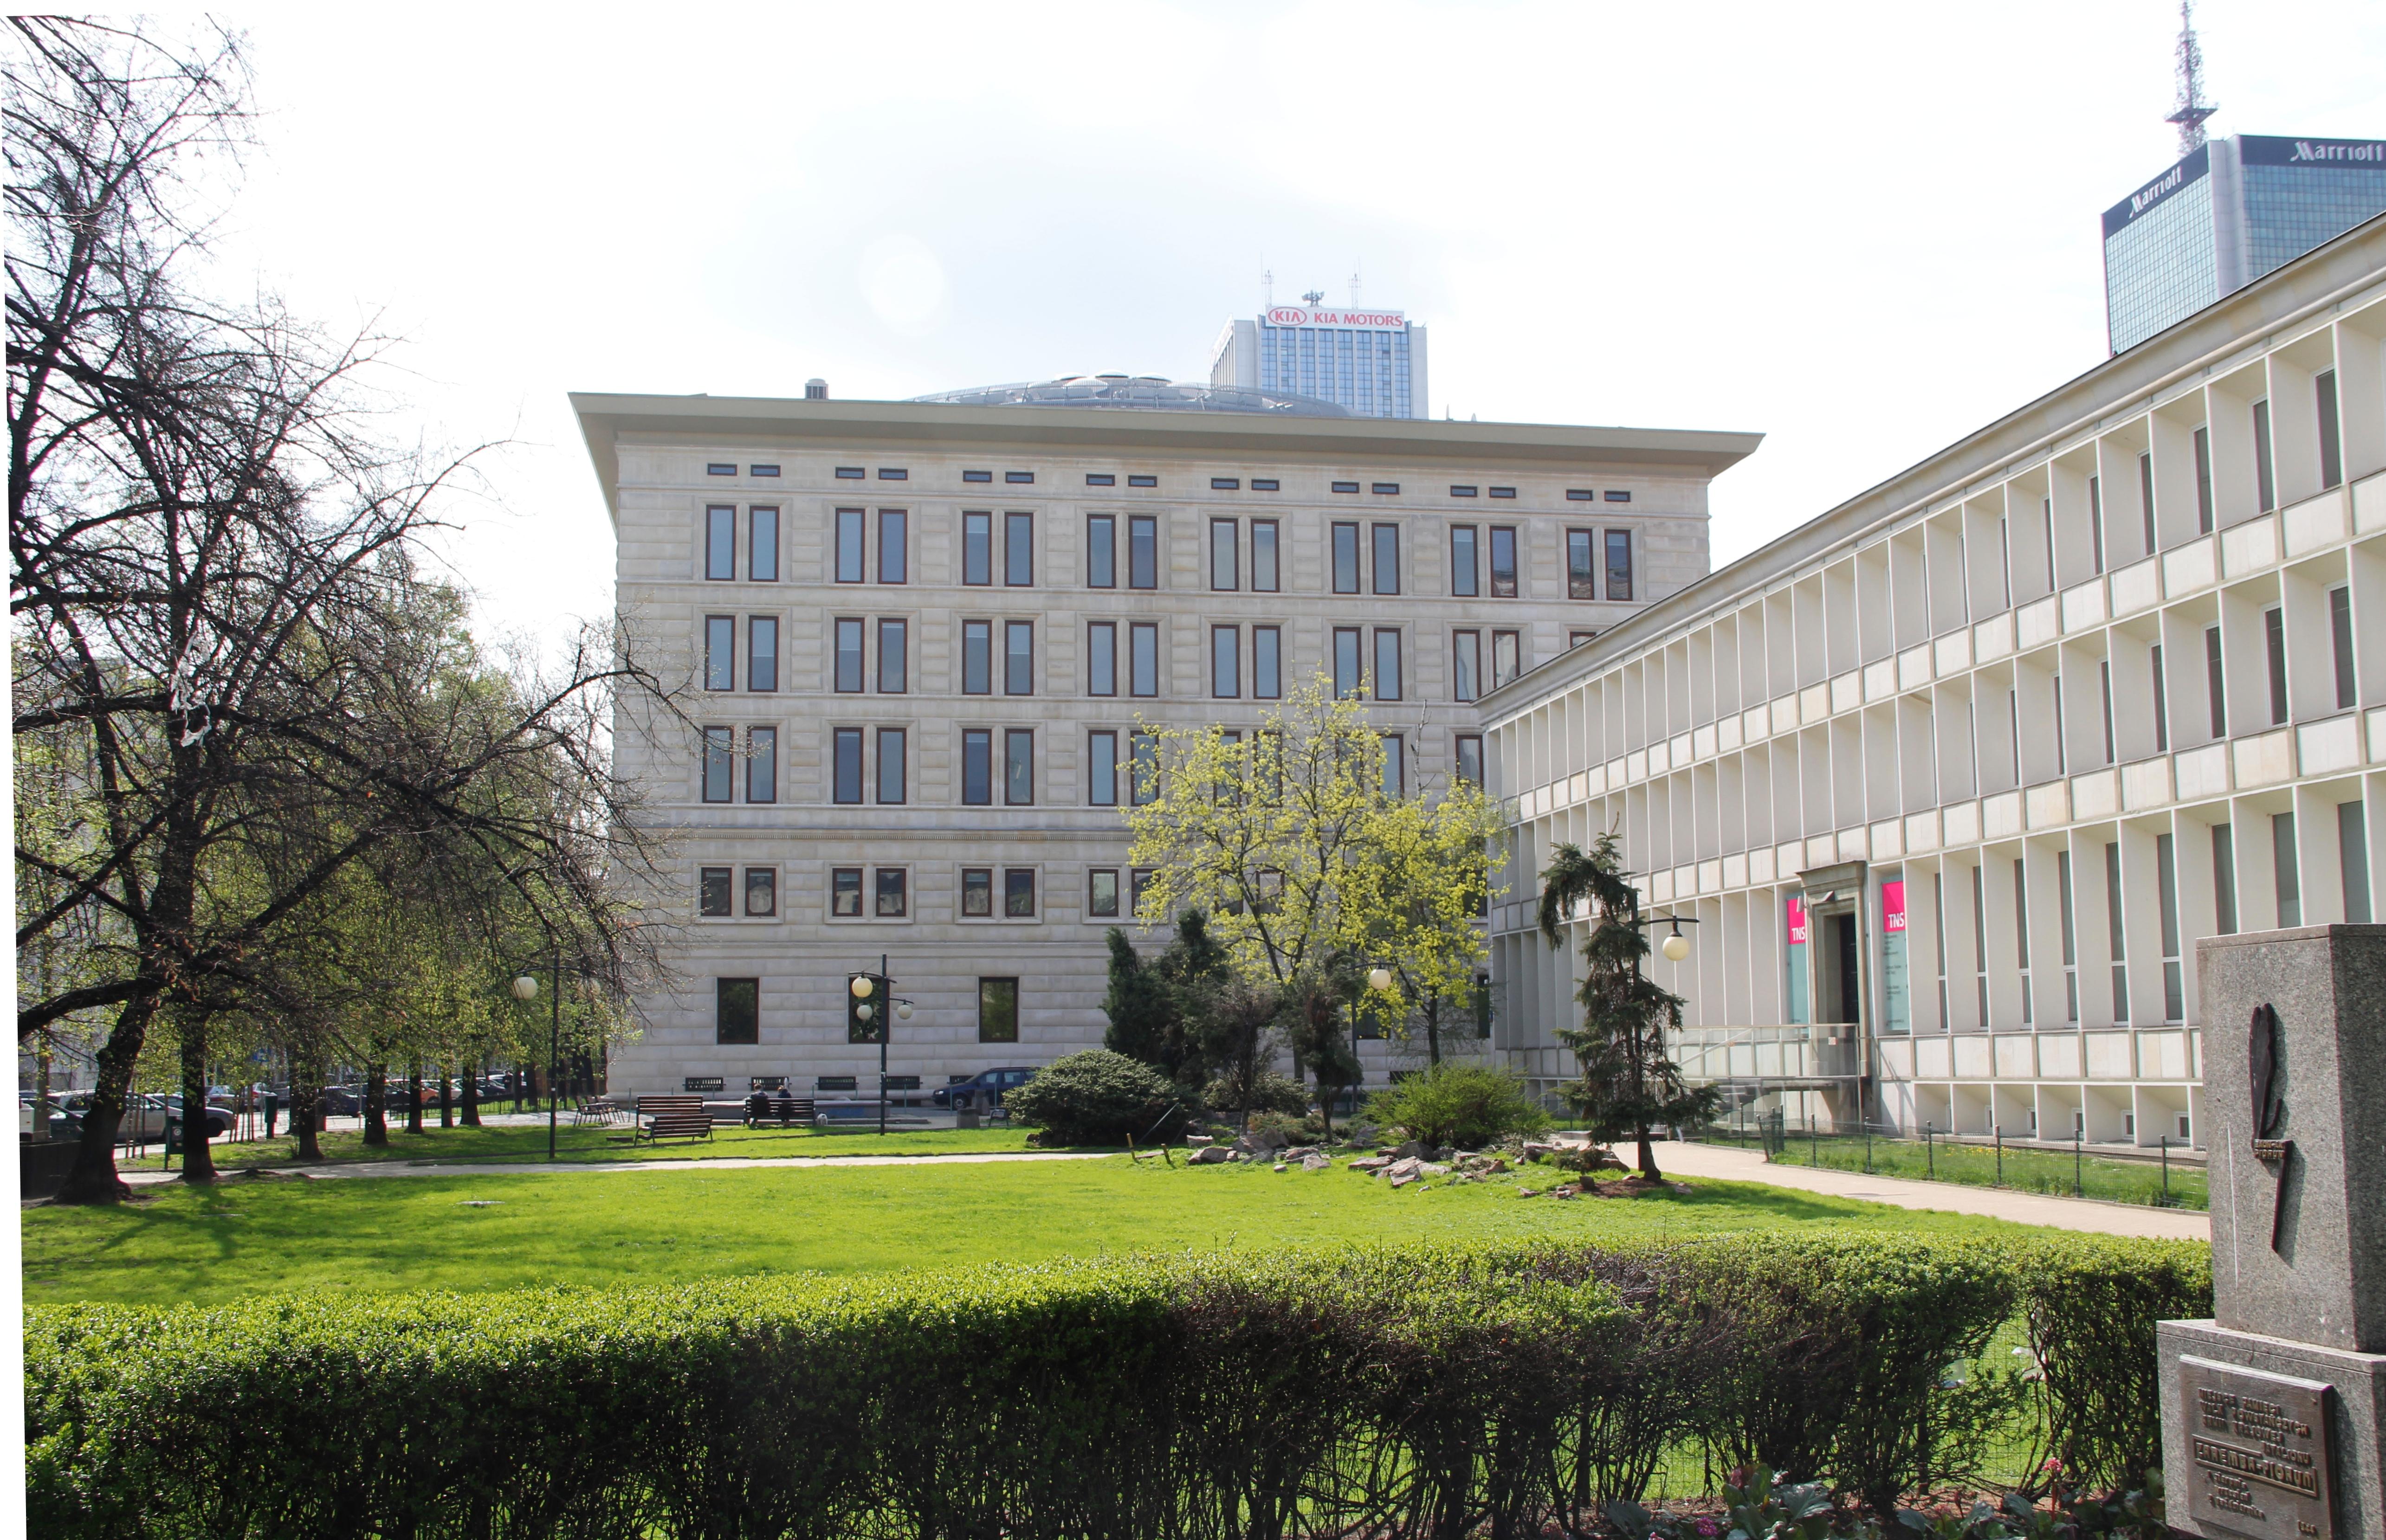 Ufficio Primo : File:biurowiec prezydium rządu ufficio primo warsaw mg 2933.jpg